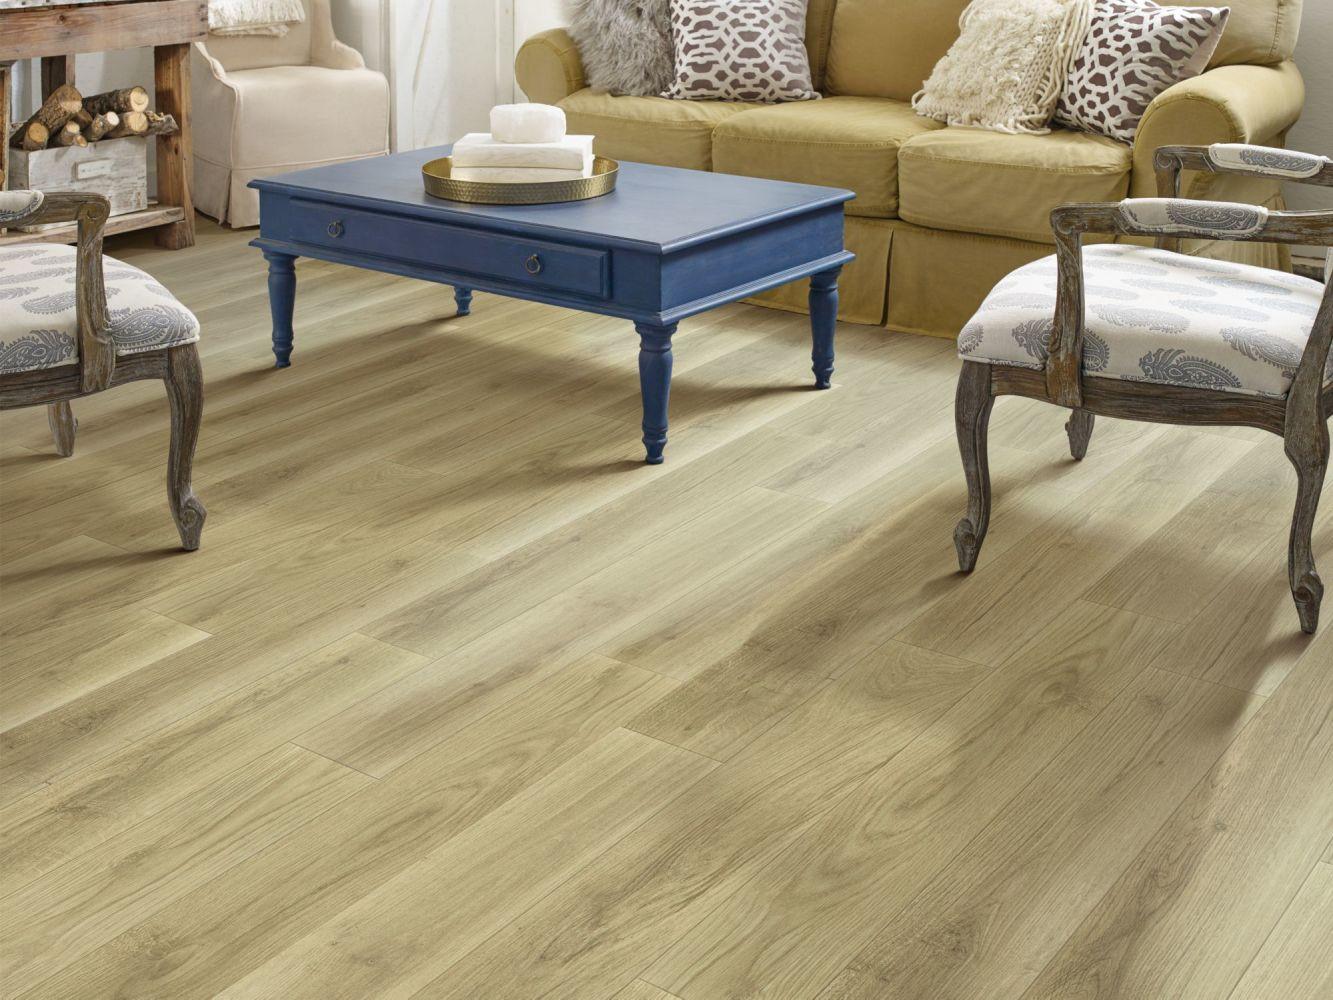 Shaw Floors Resilient Residential Tivoli Plus Rocco 00265_0845V